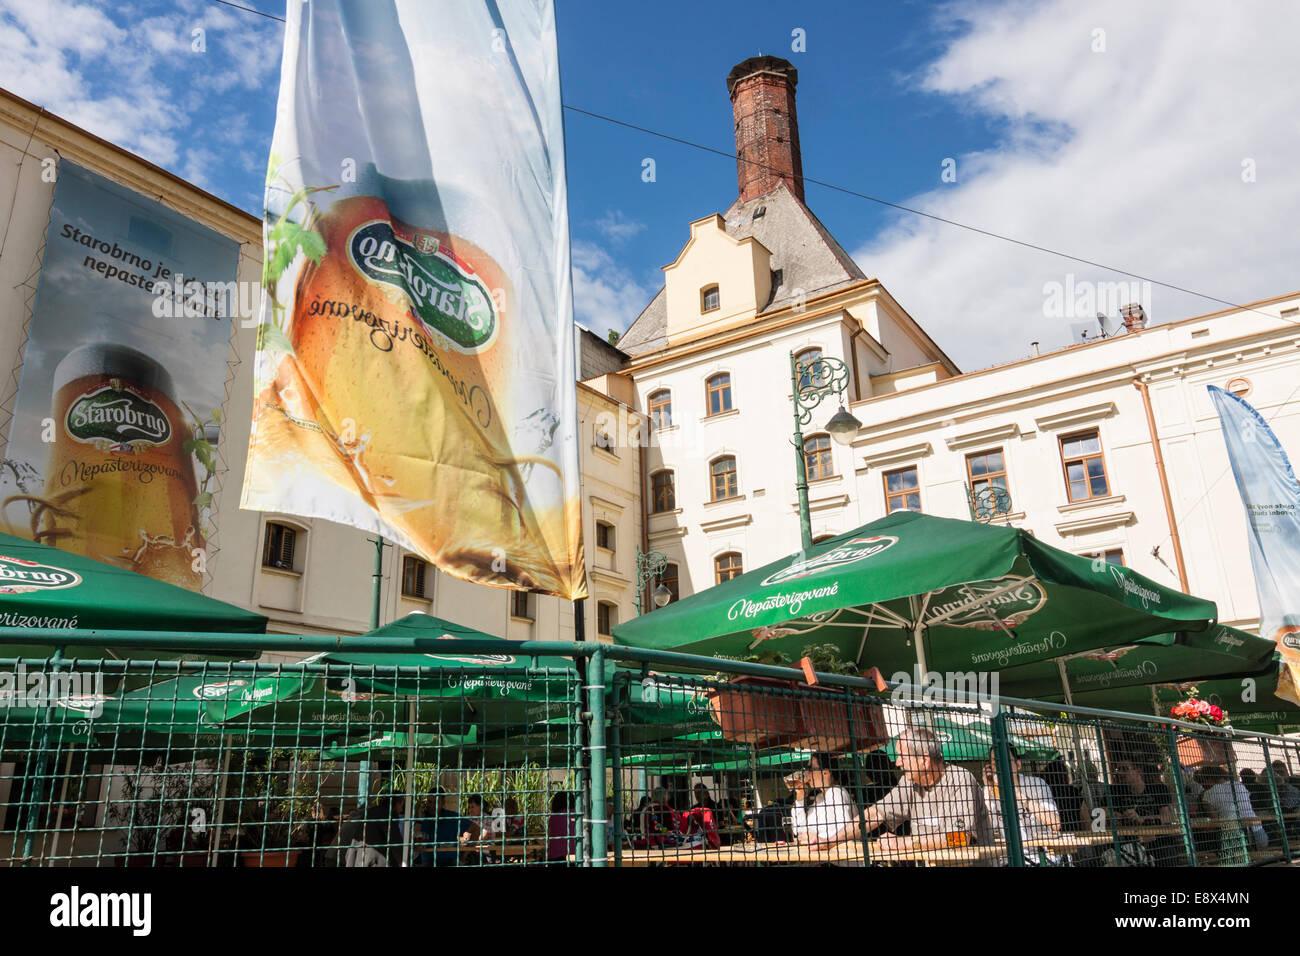 Starobrno former  brewery, now a brewpub in Brno, Czech Republic - Stock Image